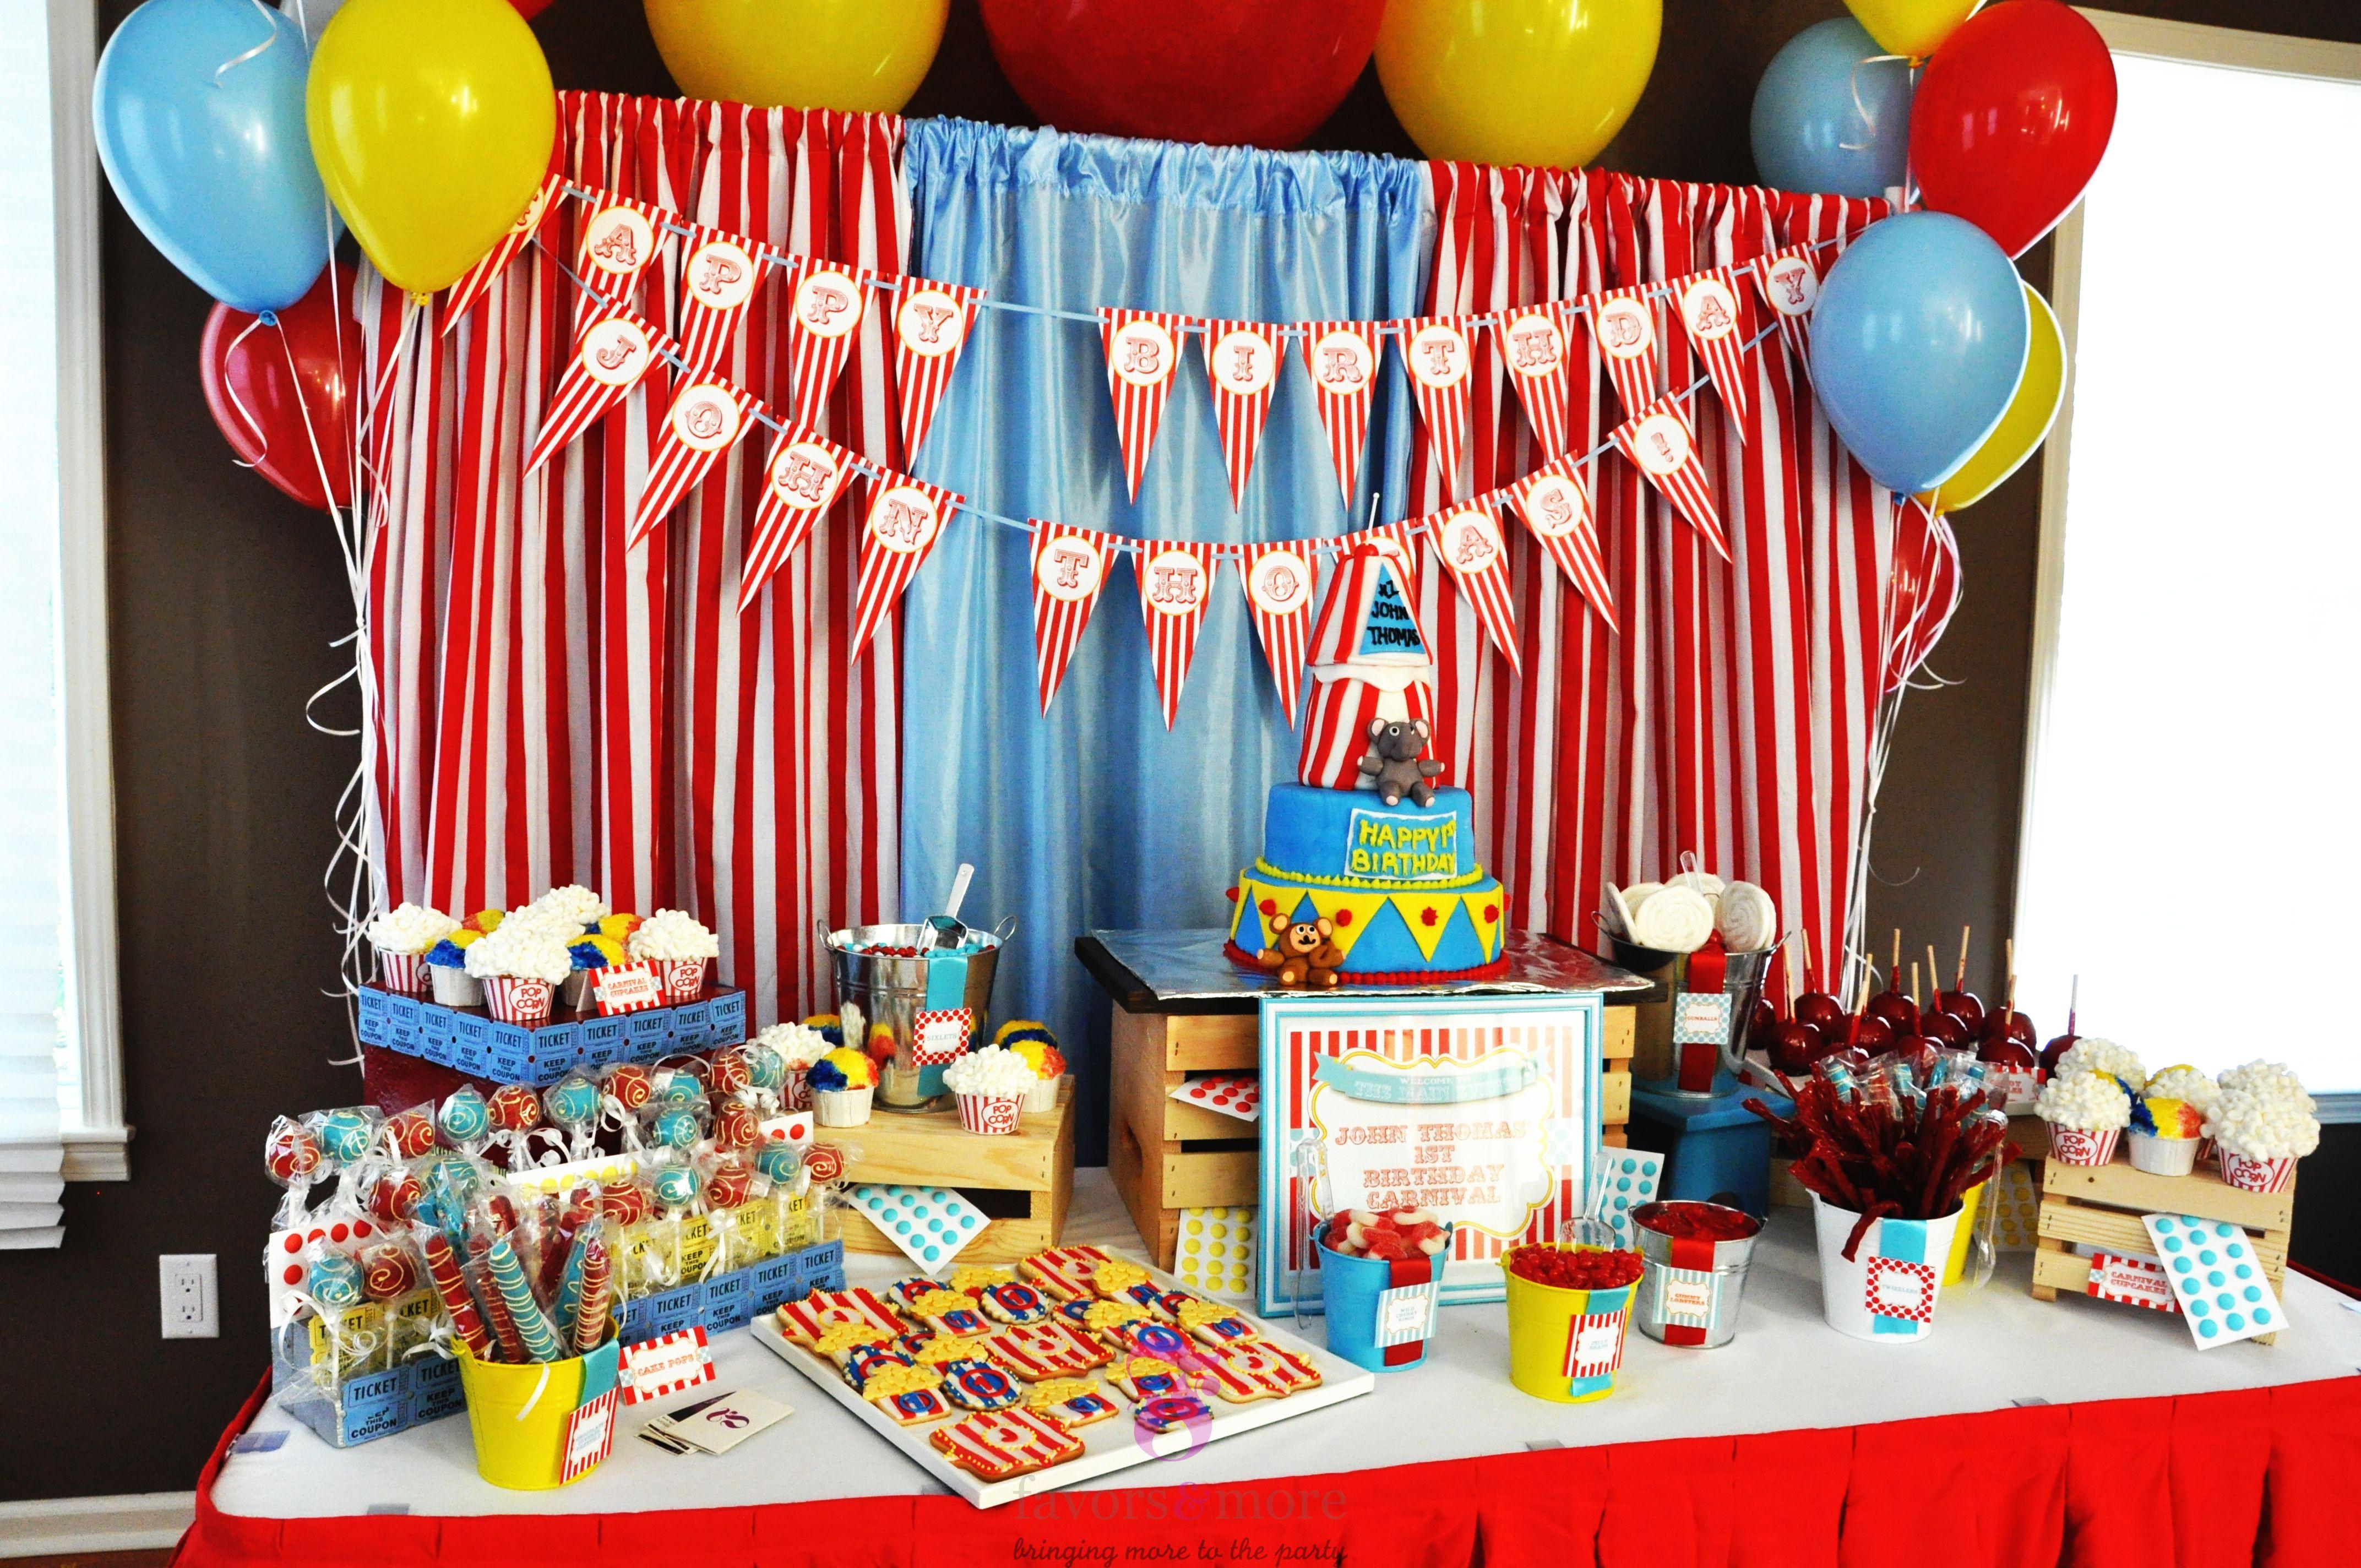 Best ideas about Best Birthday Party Ideas . Save or Pin 15 Best Carnival Birthday Party Ideas Now.